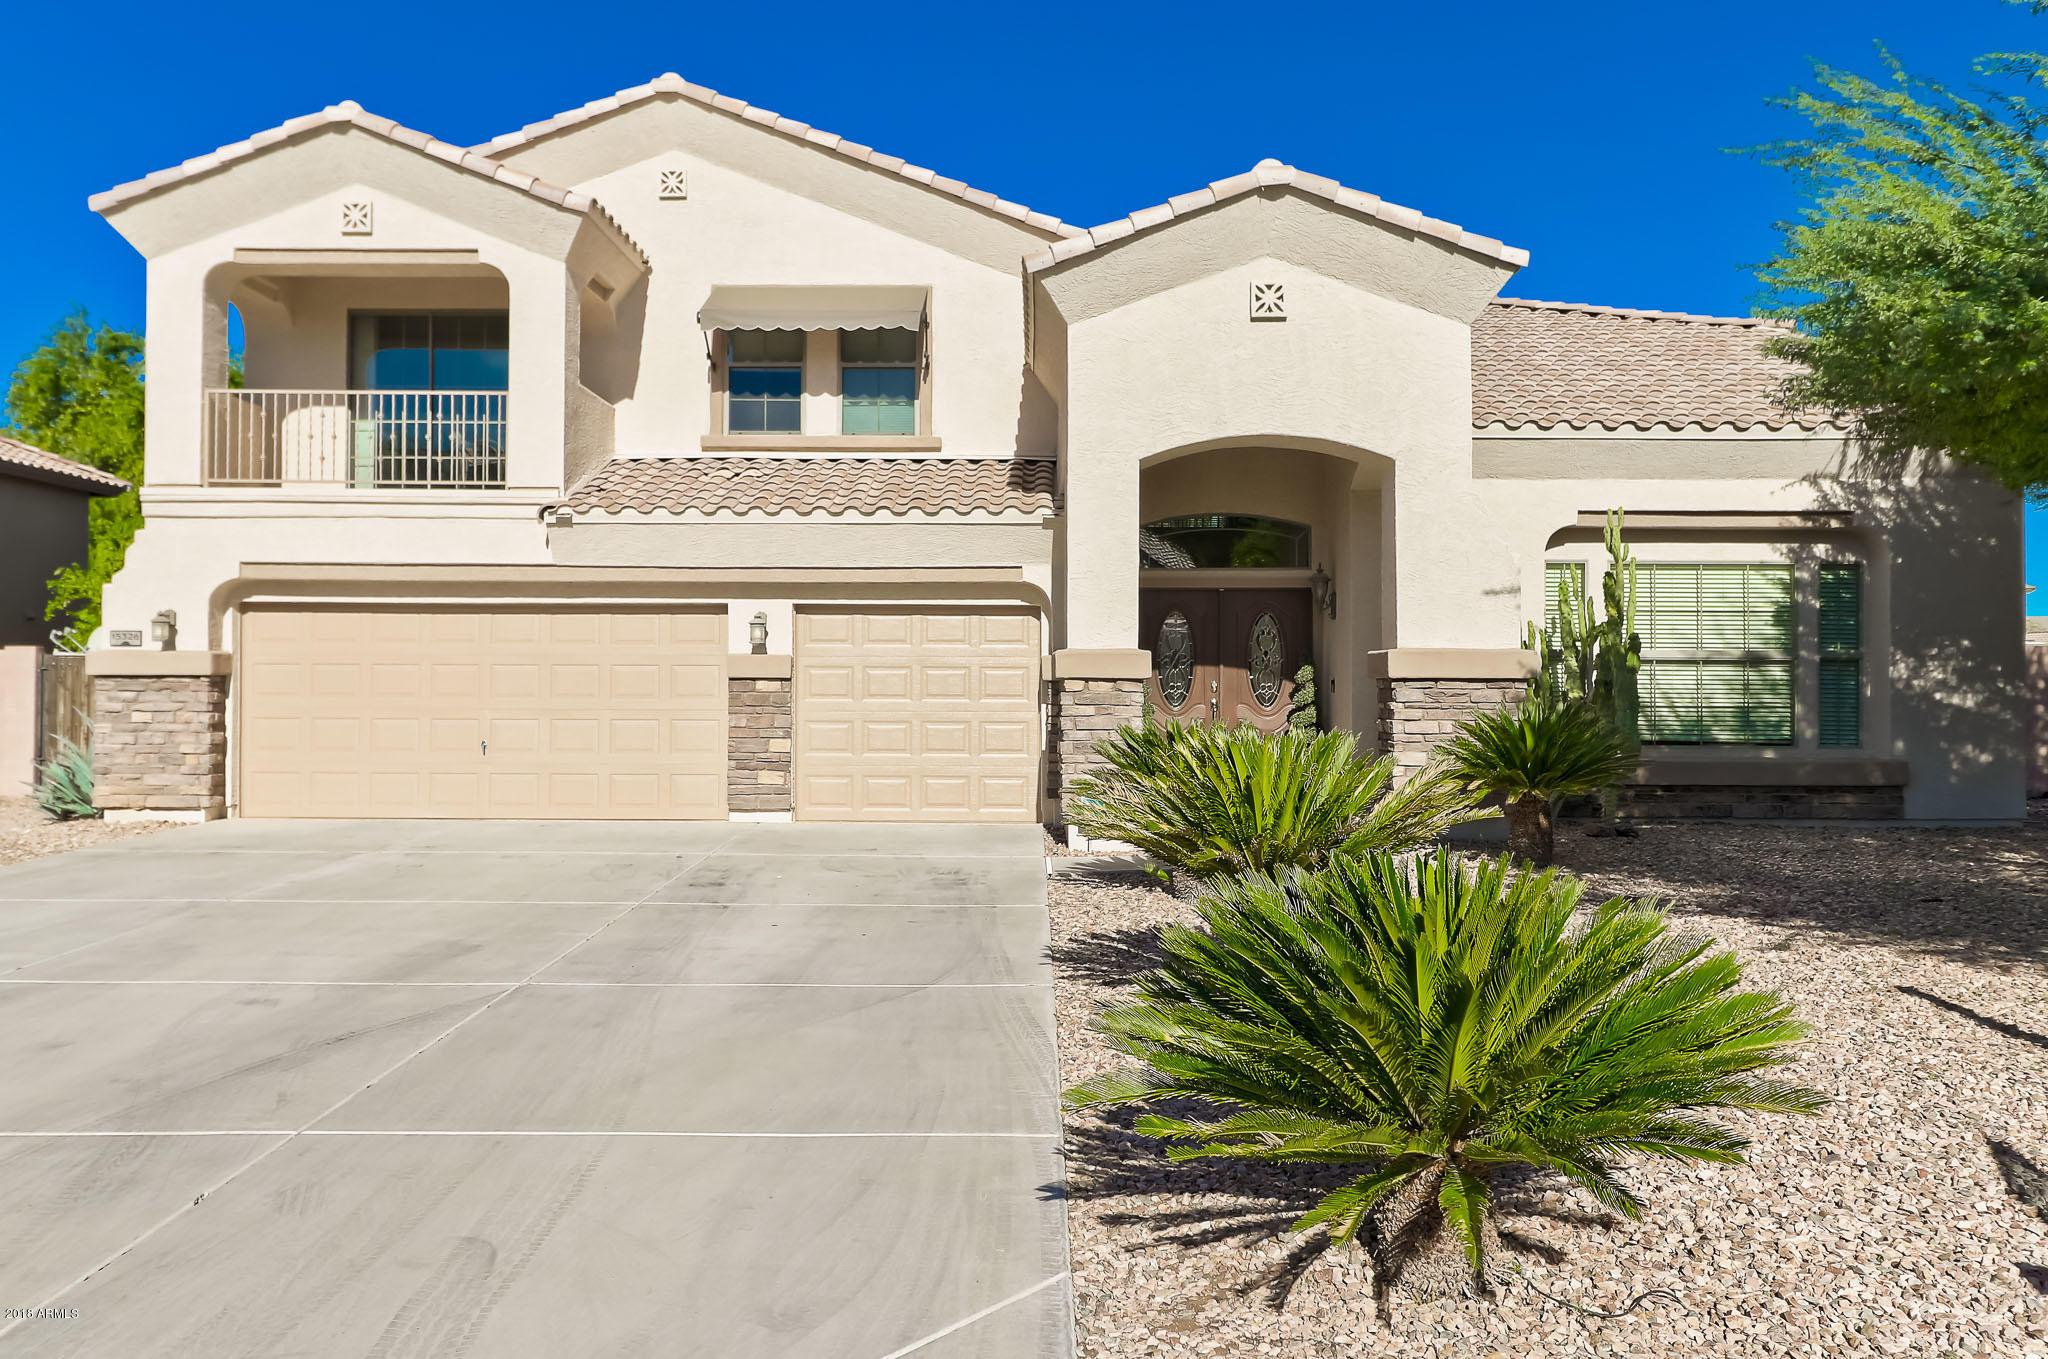 MLS 5838135 15326 W DESERT MIRAGE Drive, Surprise, AZ 85379 Surprise AZ Gated